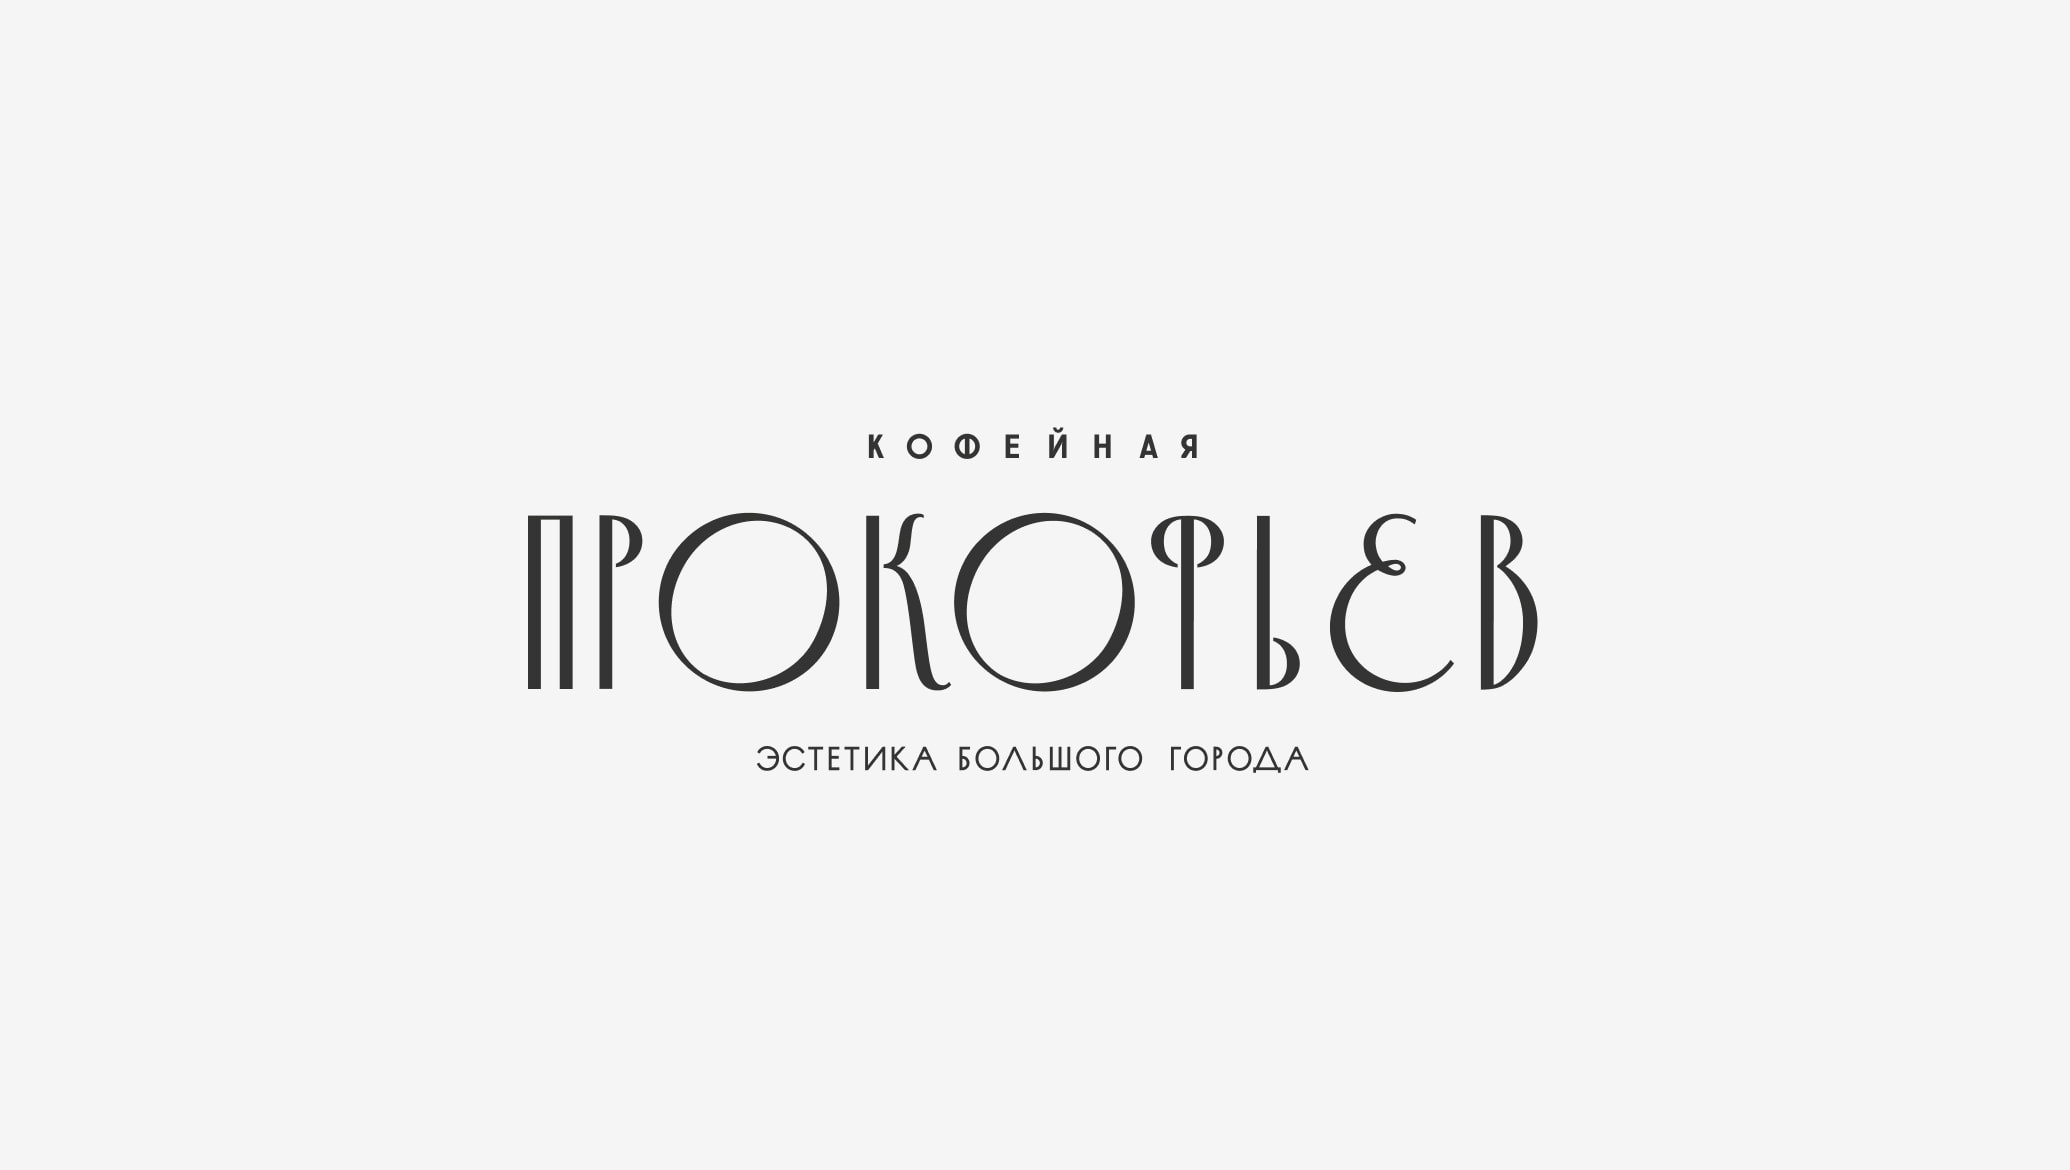 prokofiev_02-1